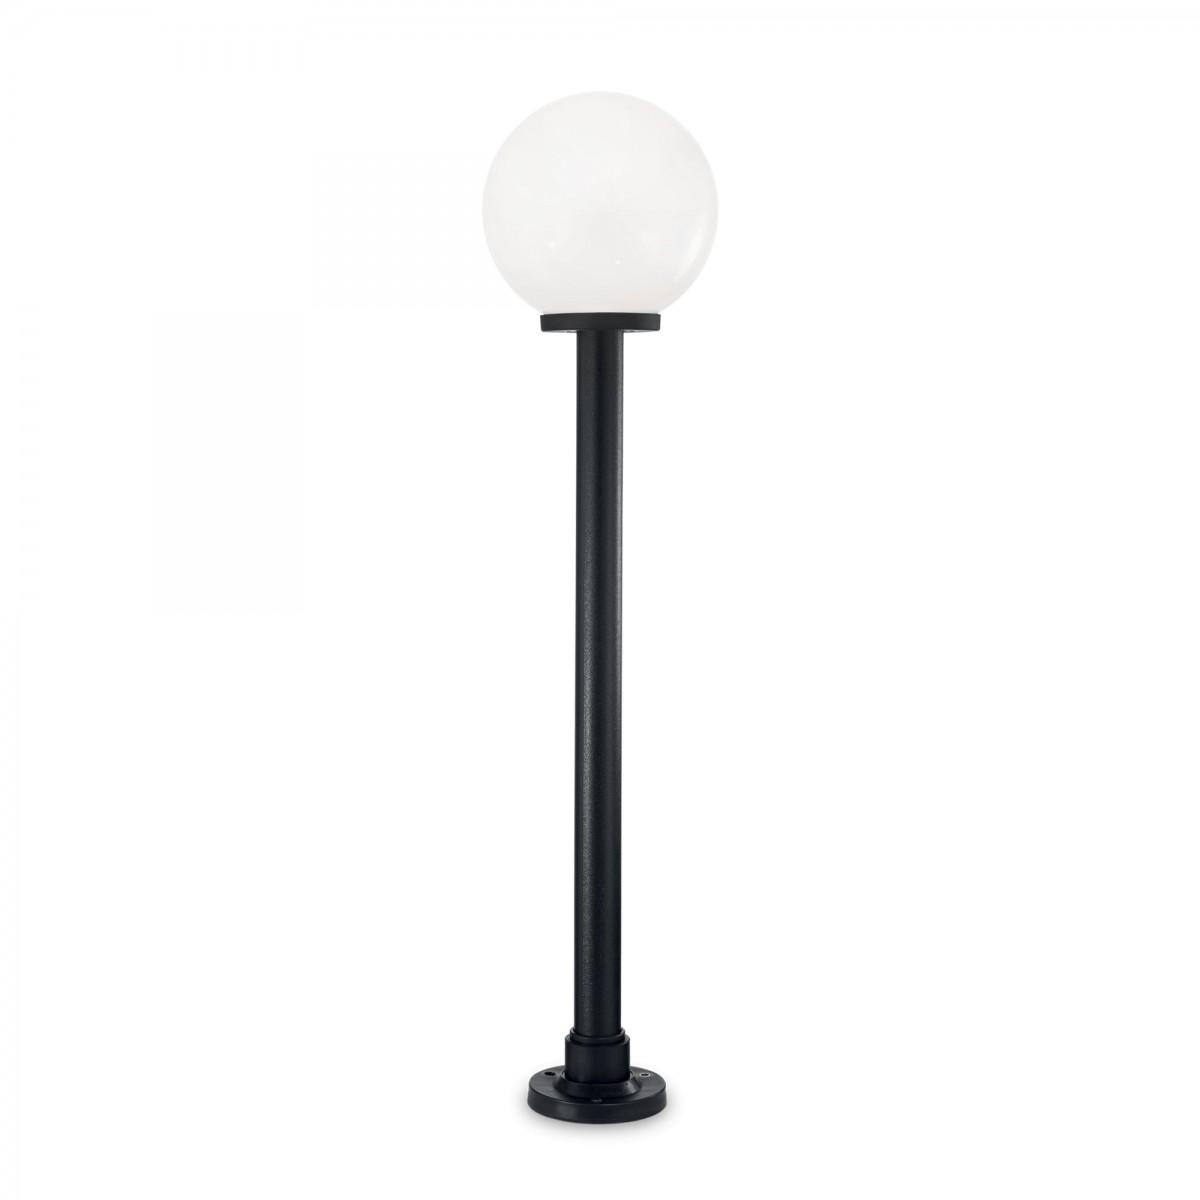 Ideal Lux 187525 venkovní lampa Classic Globe 1x23W|E27